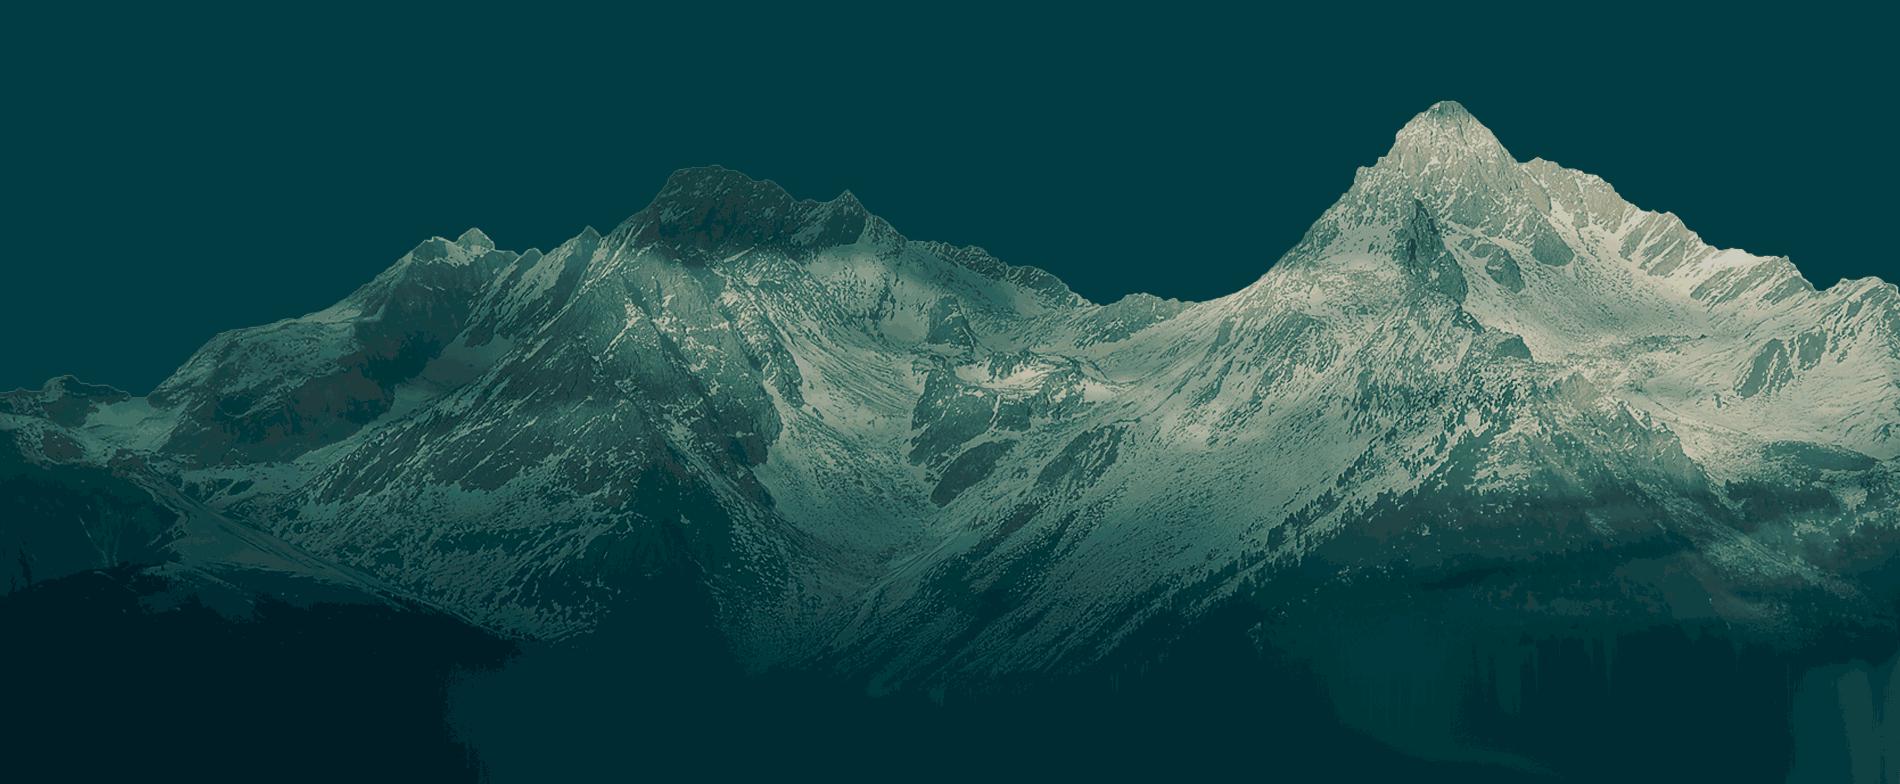 PNG HD Mountain Range